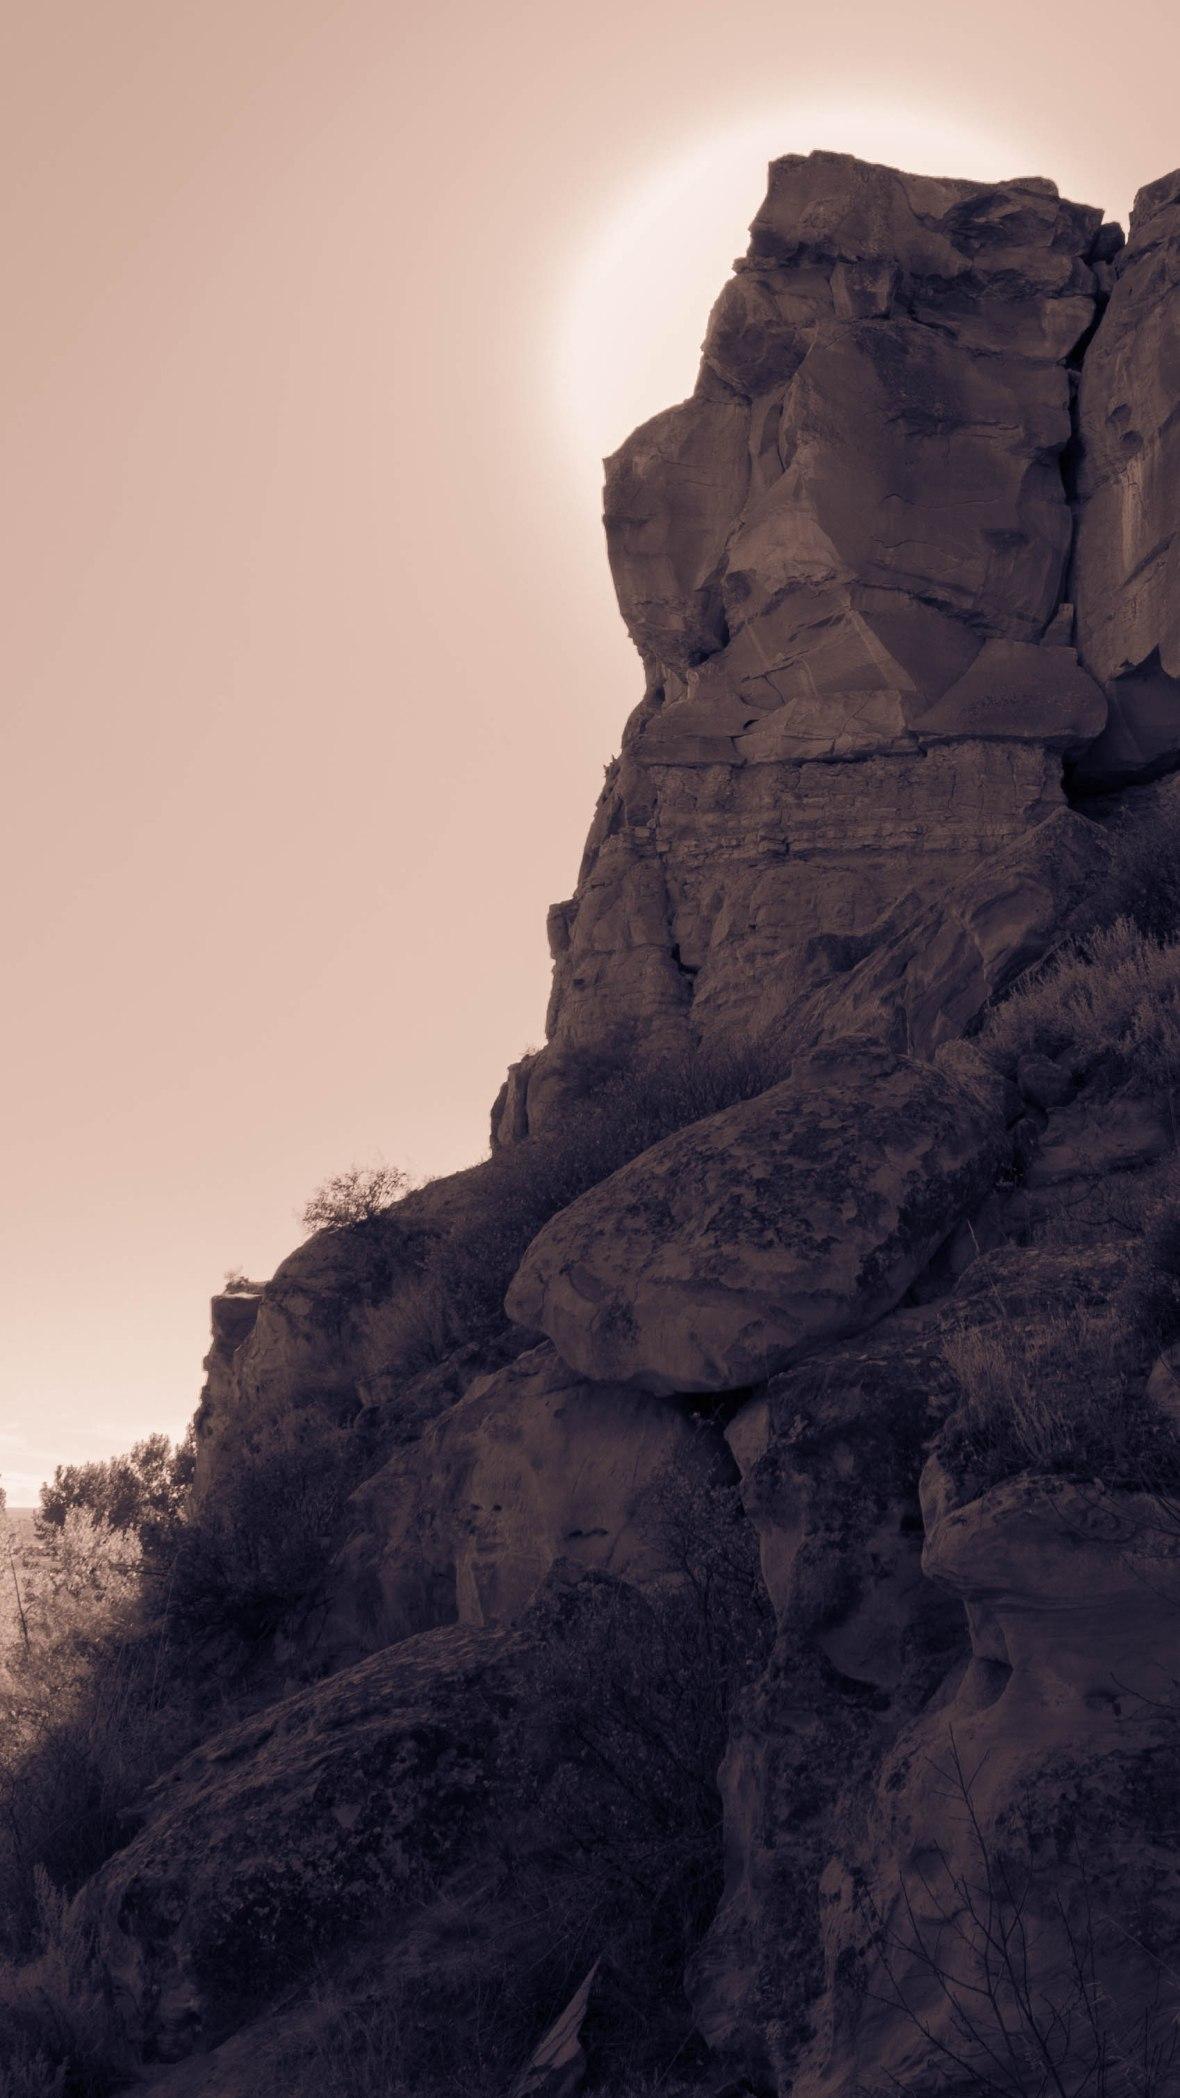 Pomps pillar